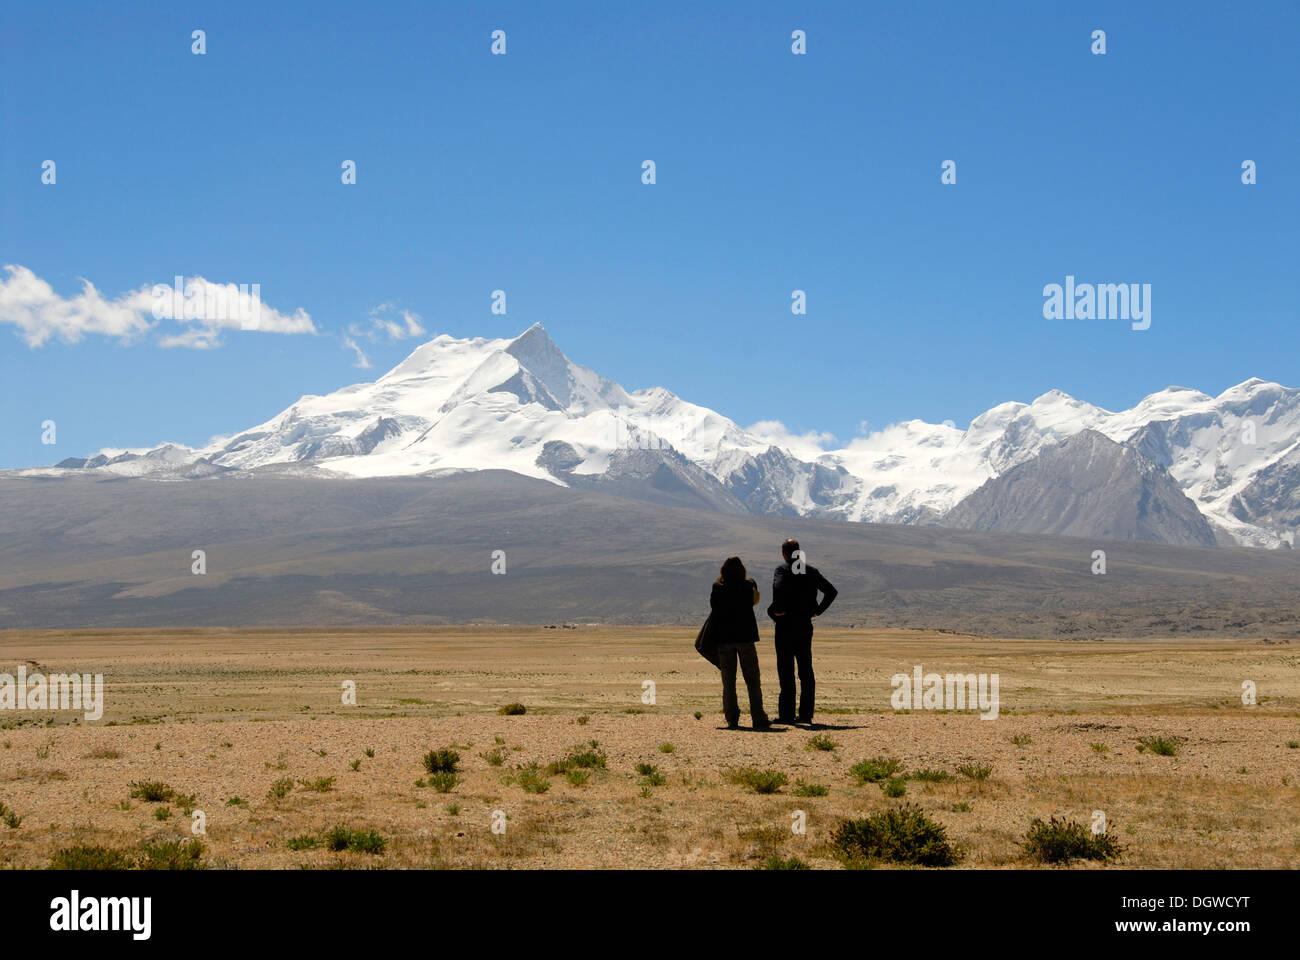 Two people in silhouette, wide landscape, near Lake Pelku Tso, high plateau, looking towards Mount Shishapangma, 8013 m - Stock Image